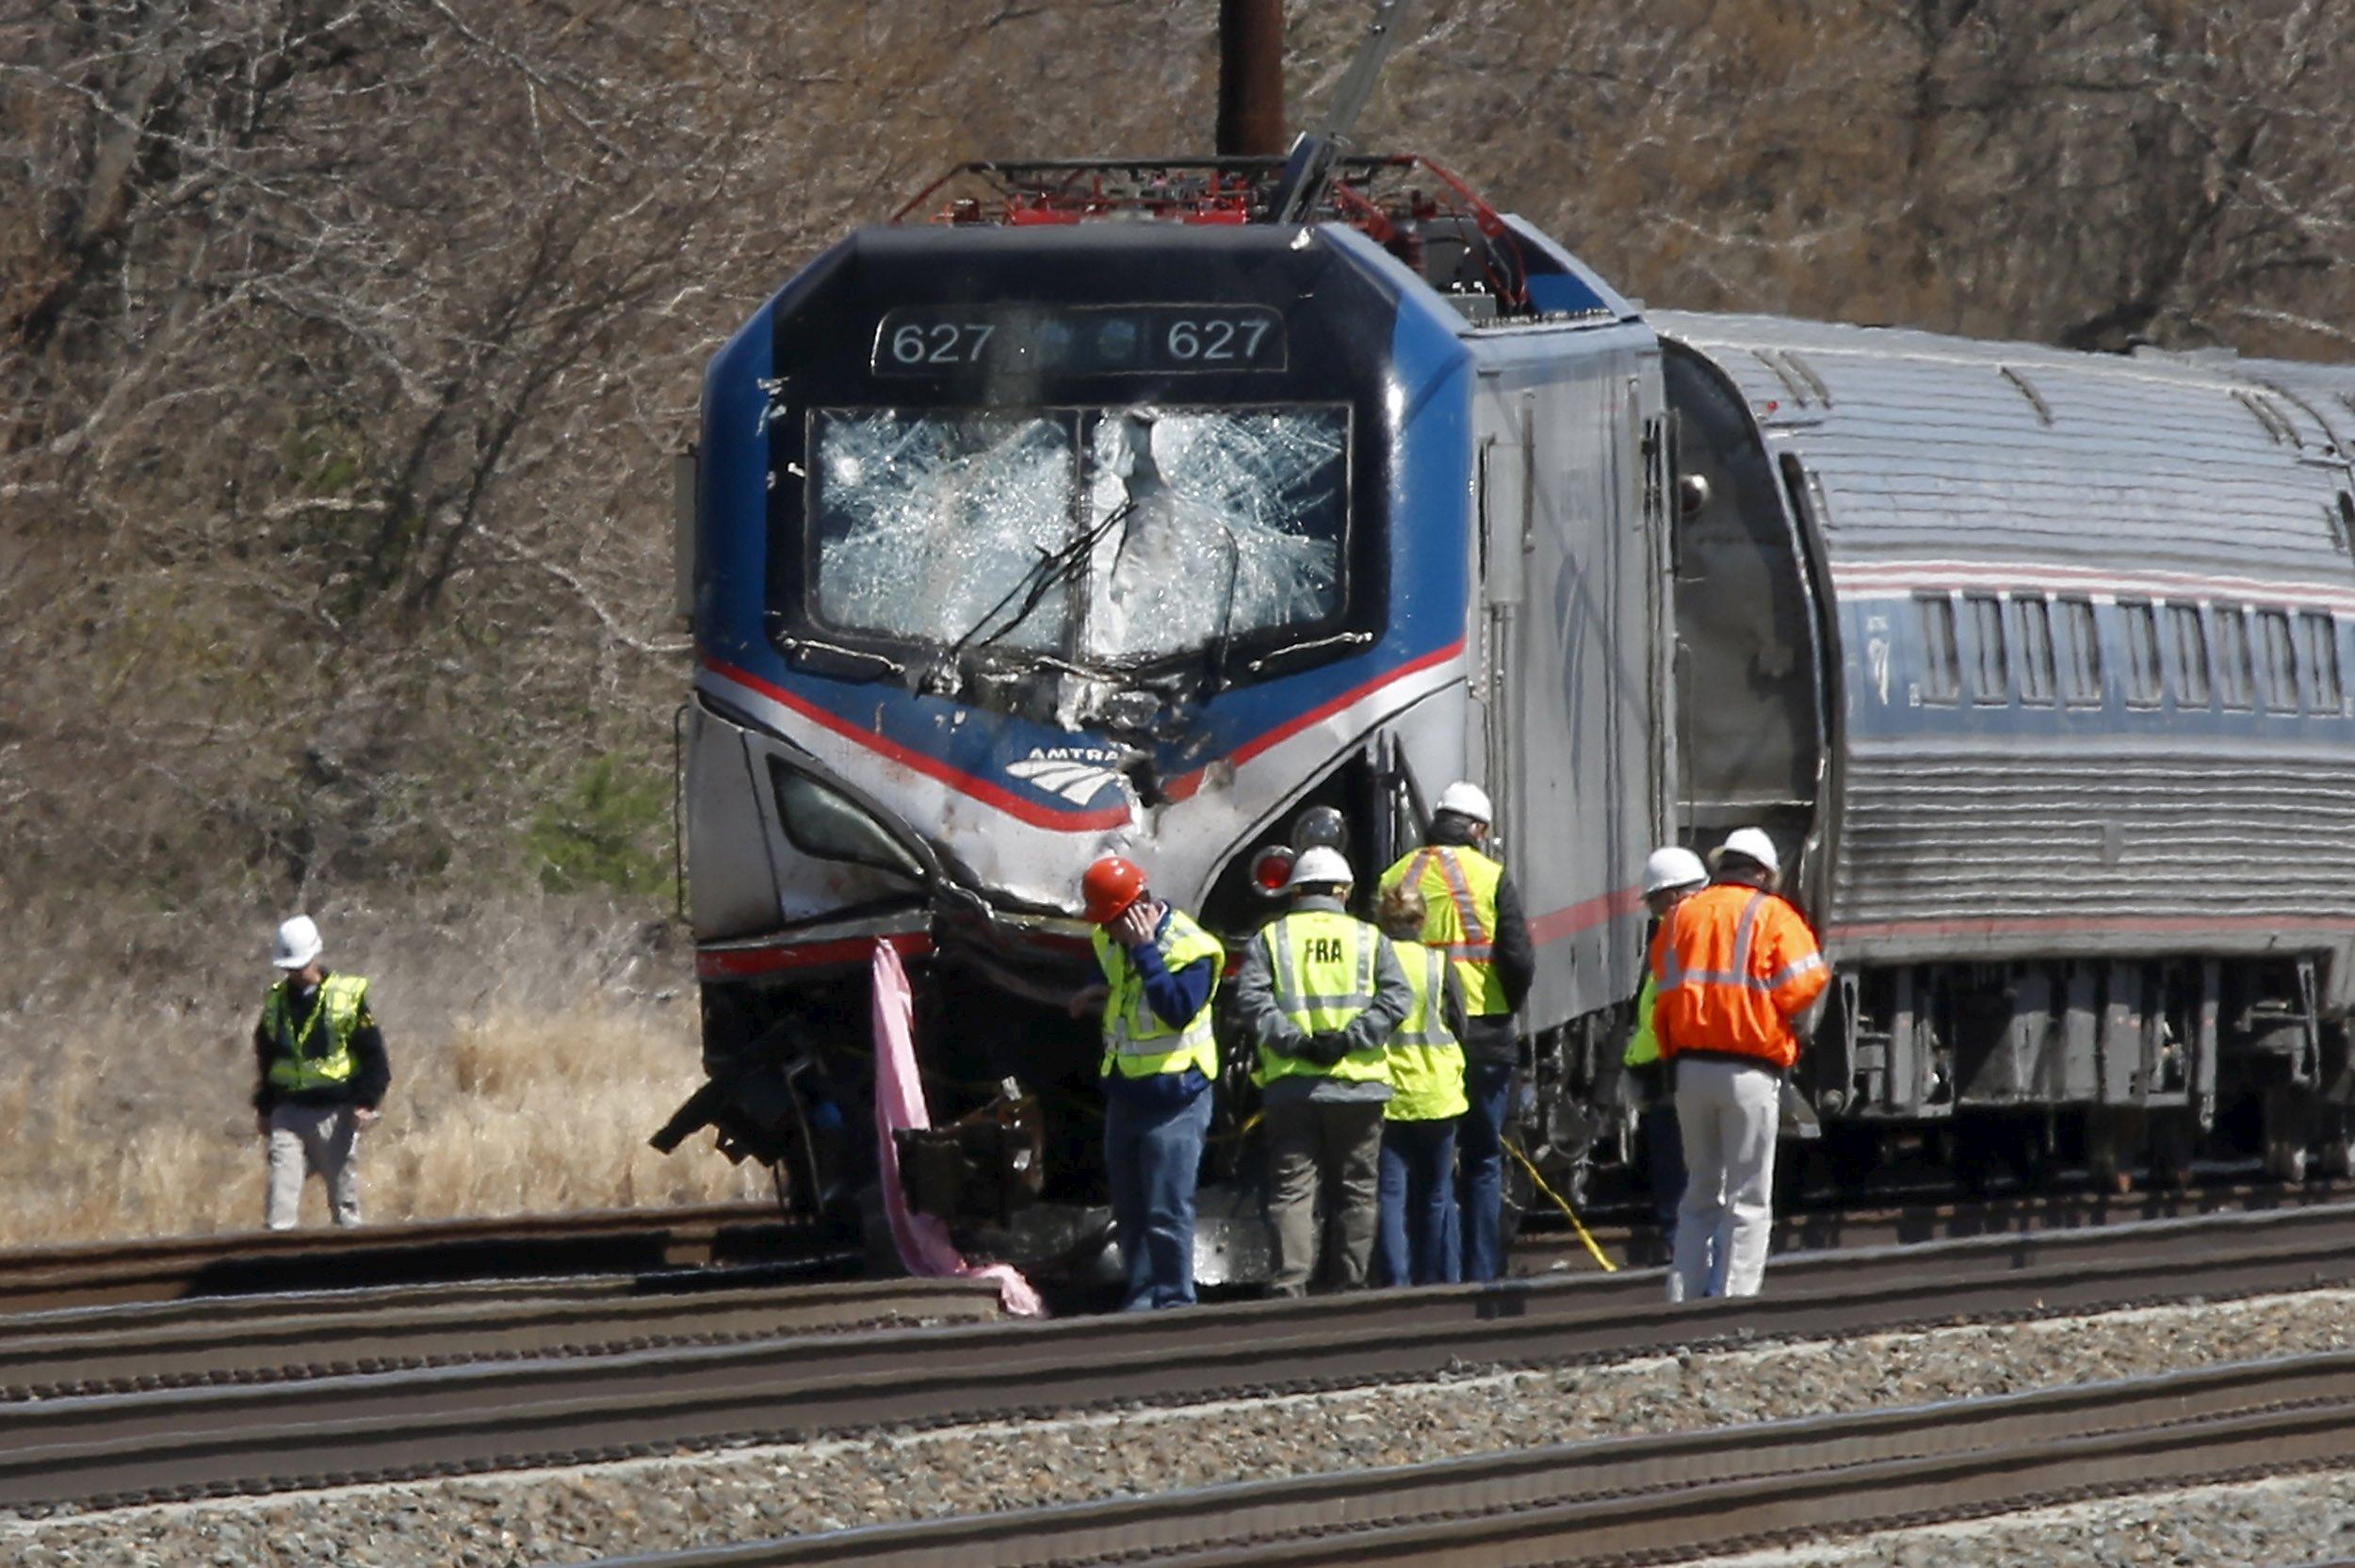 Amtrak Train Struck Backhoe At 106 Mph In Fatal Derailment